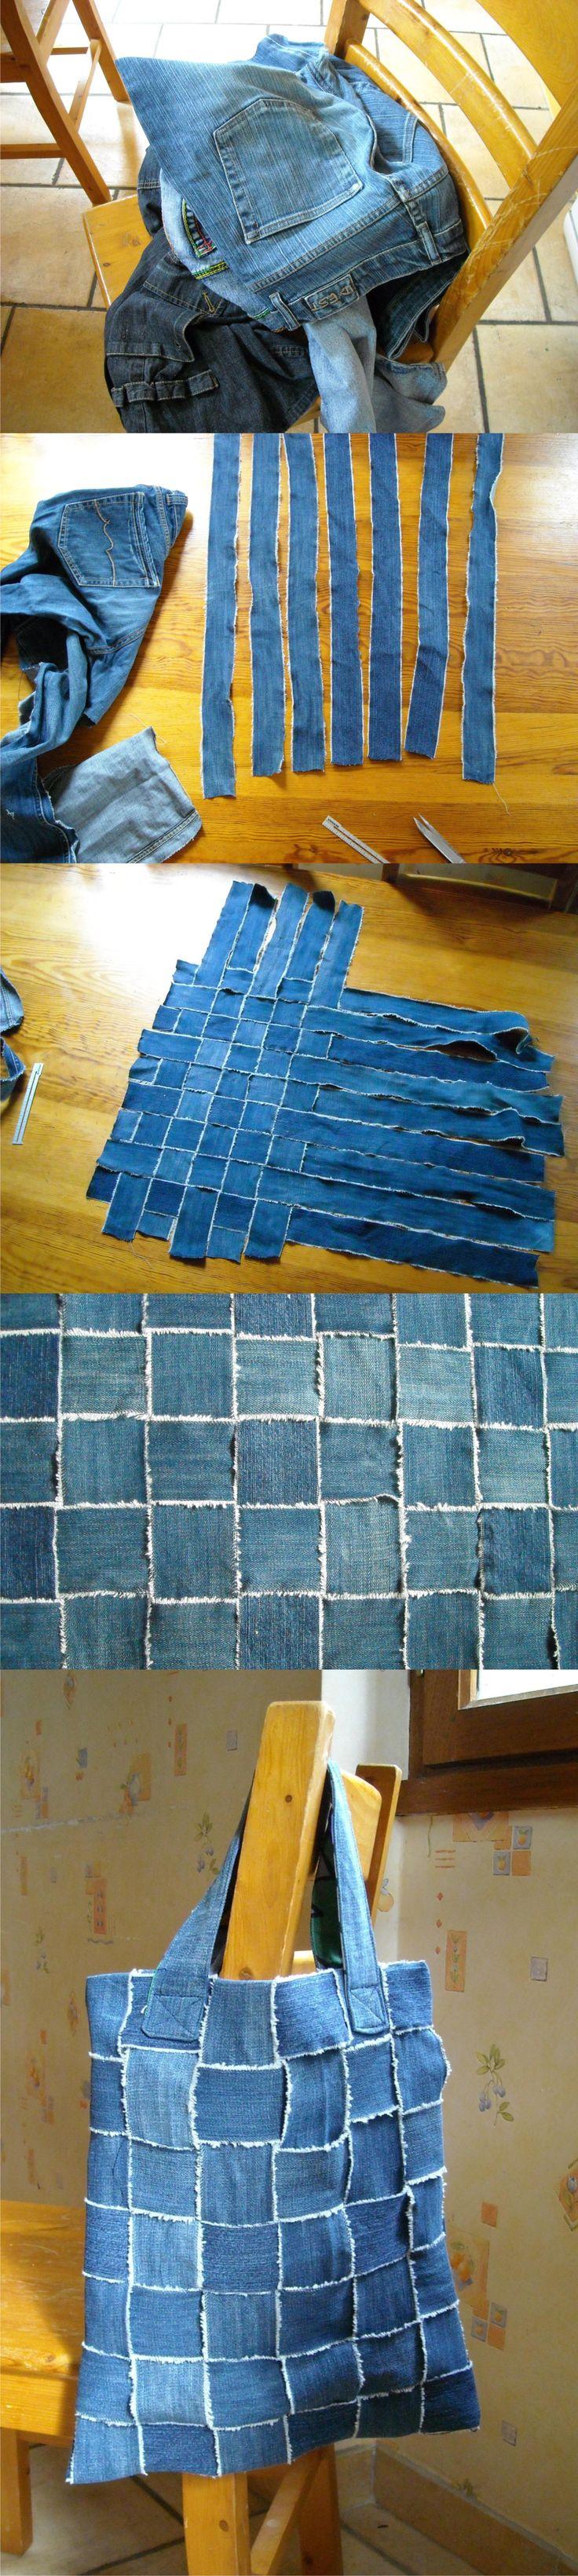 bolso reciclar jeans DIY muy ingenioso 2